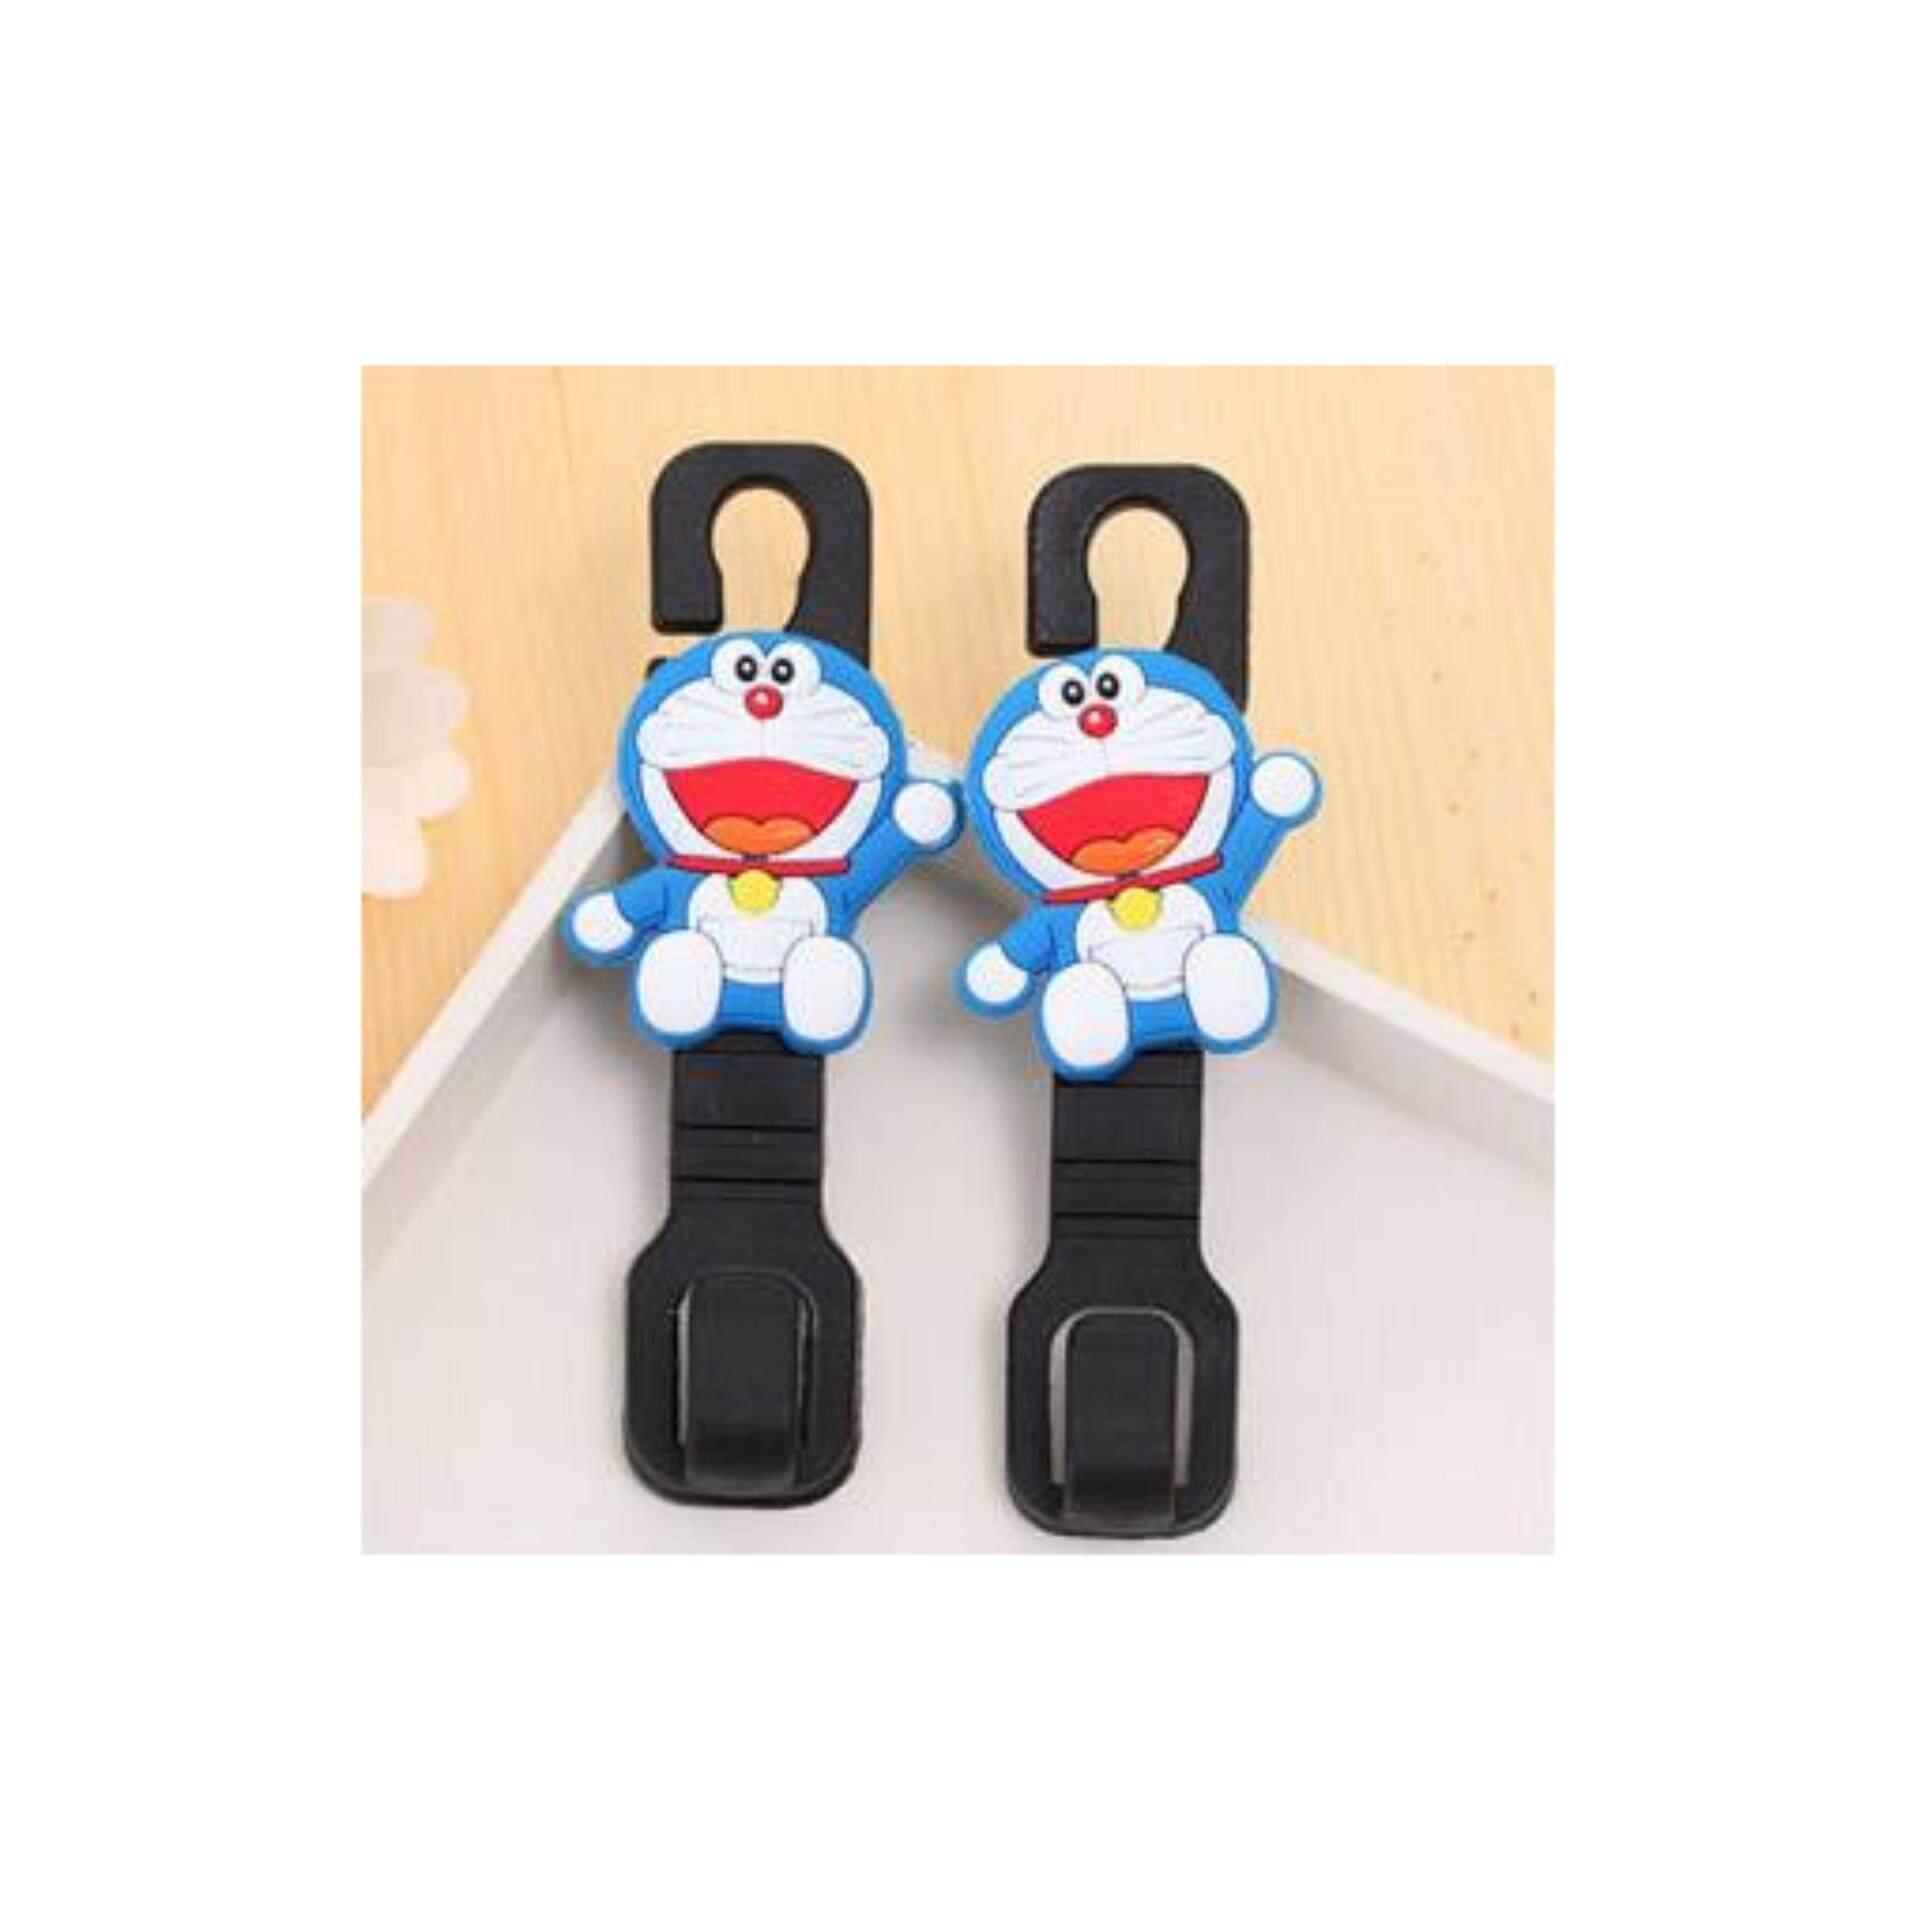 Cute Doraemon Car Seat Hanger